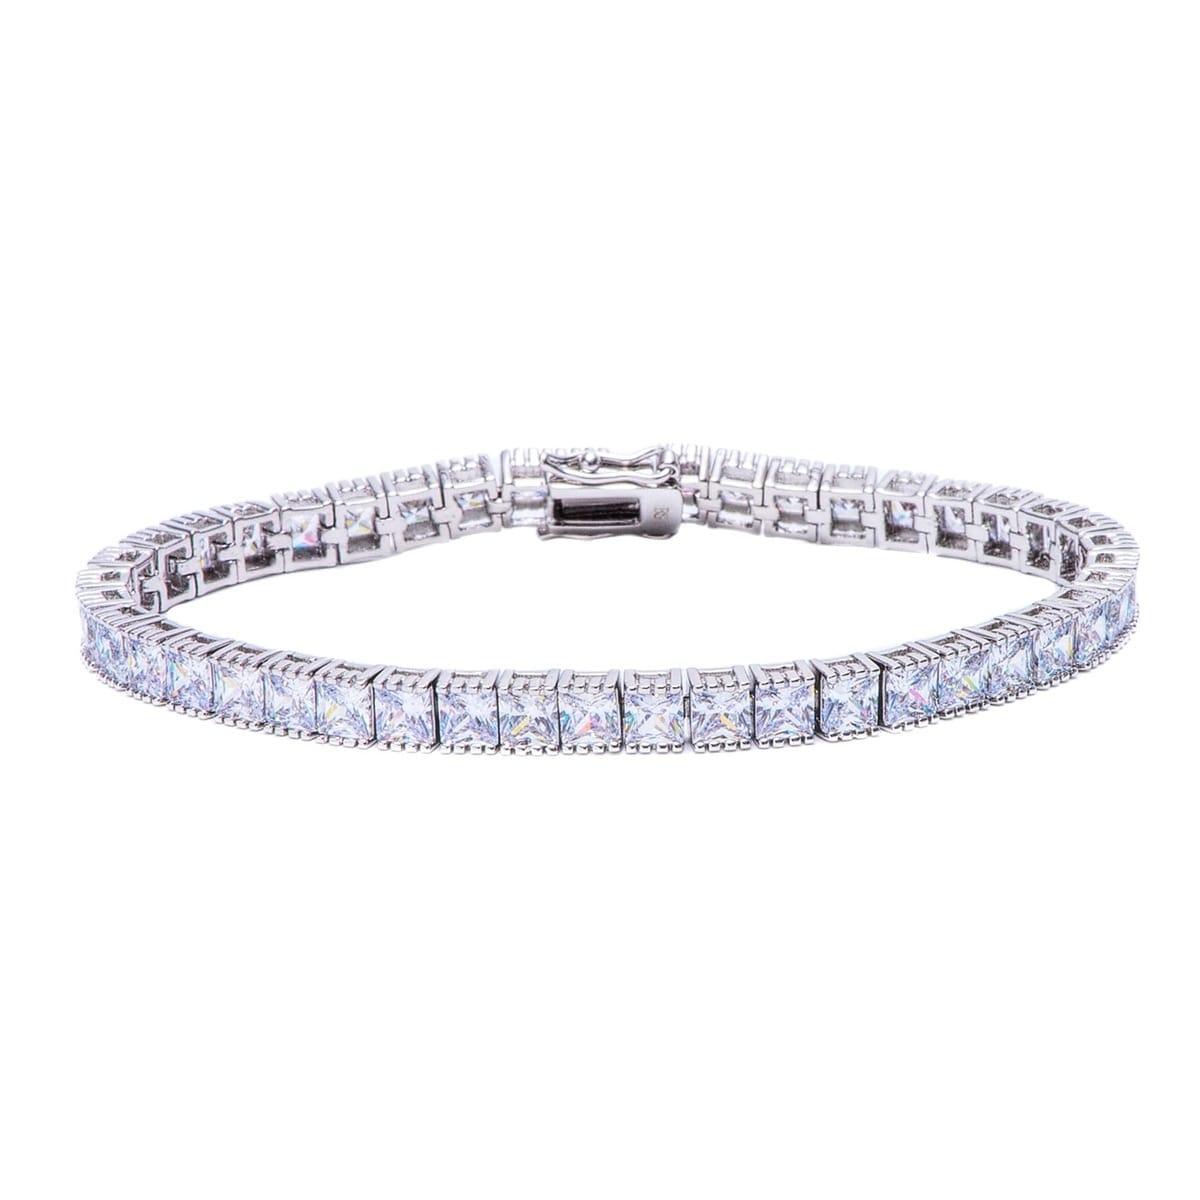 Pori Jewelers Rhodium Ptd Princess Tennis Bracelet Wcrystals By Swarovski Elements